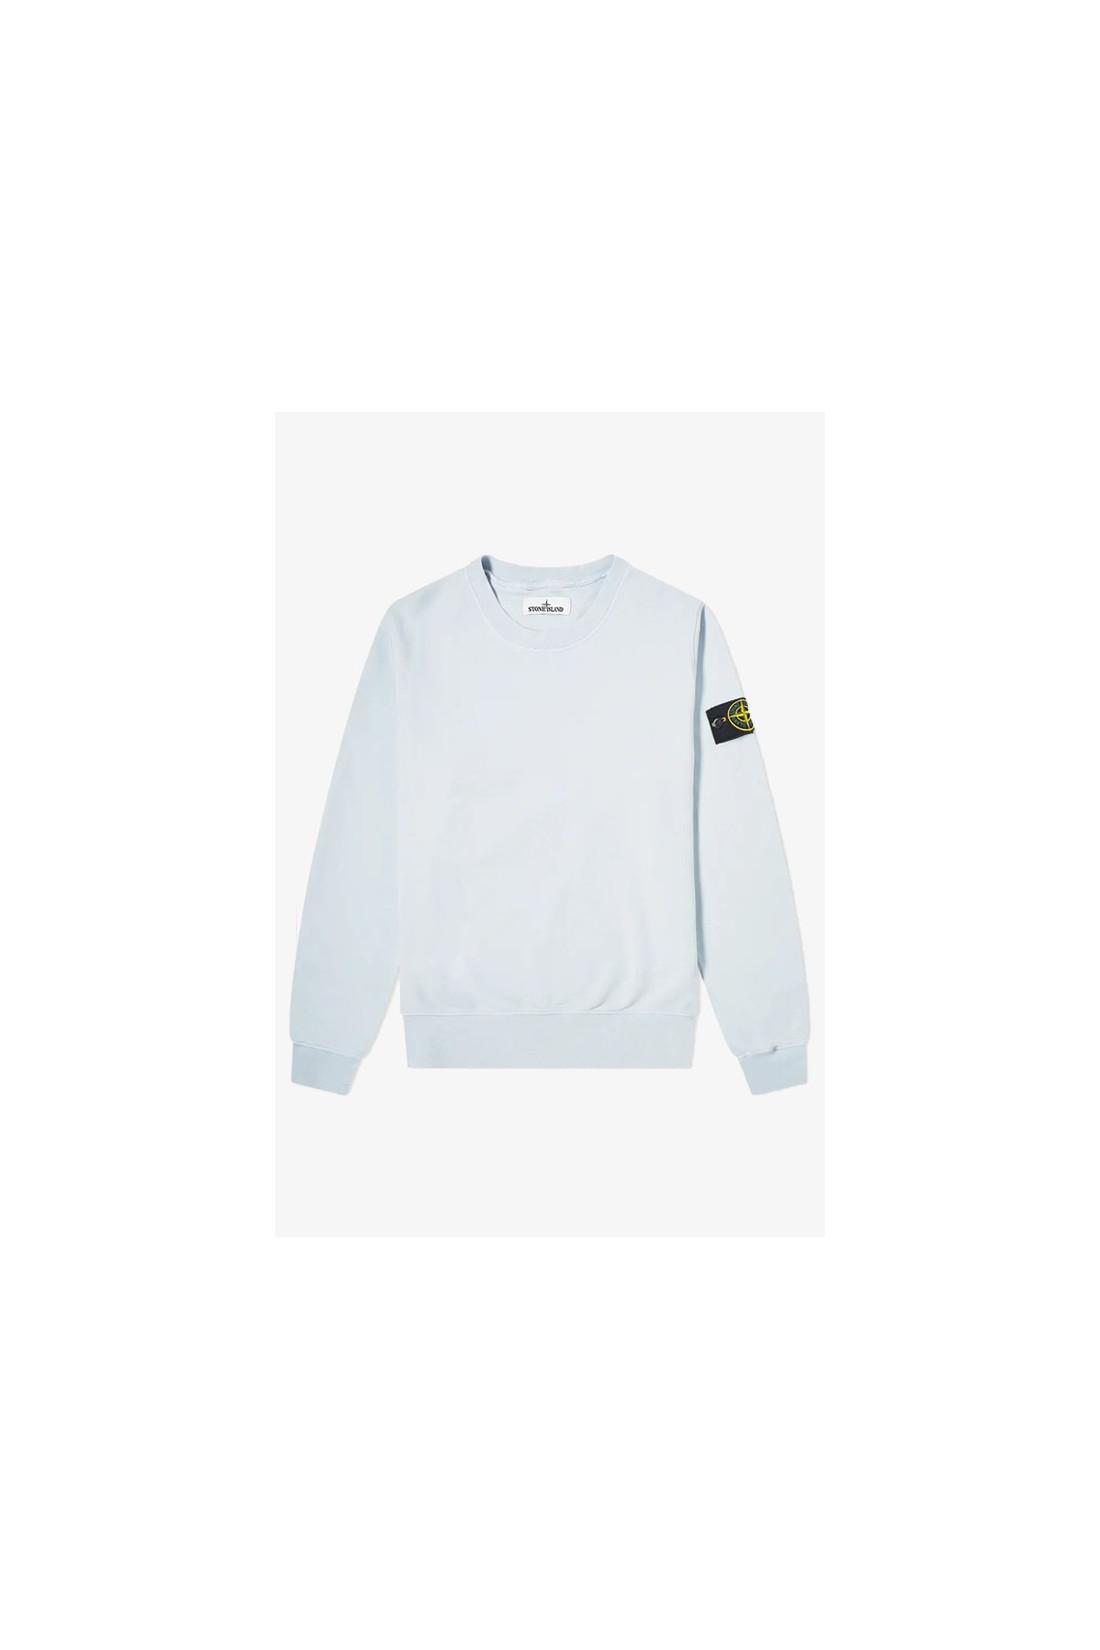 STONE ISLAND / 63051 crewneck sweater v0041 Cielo